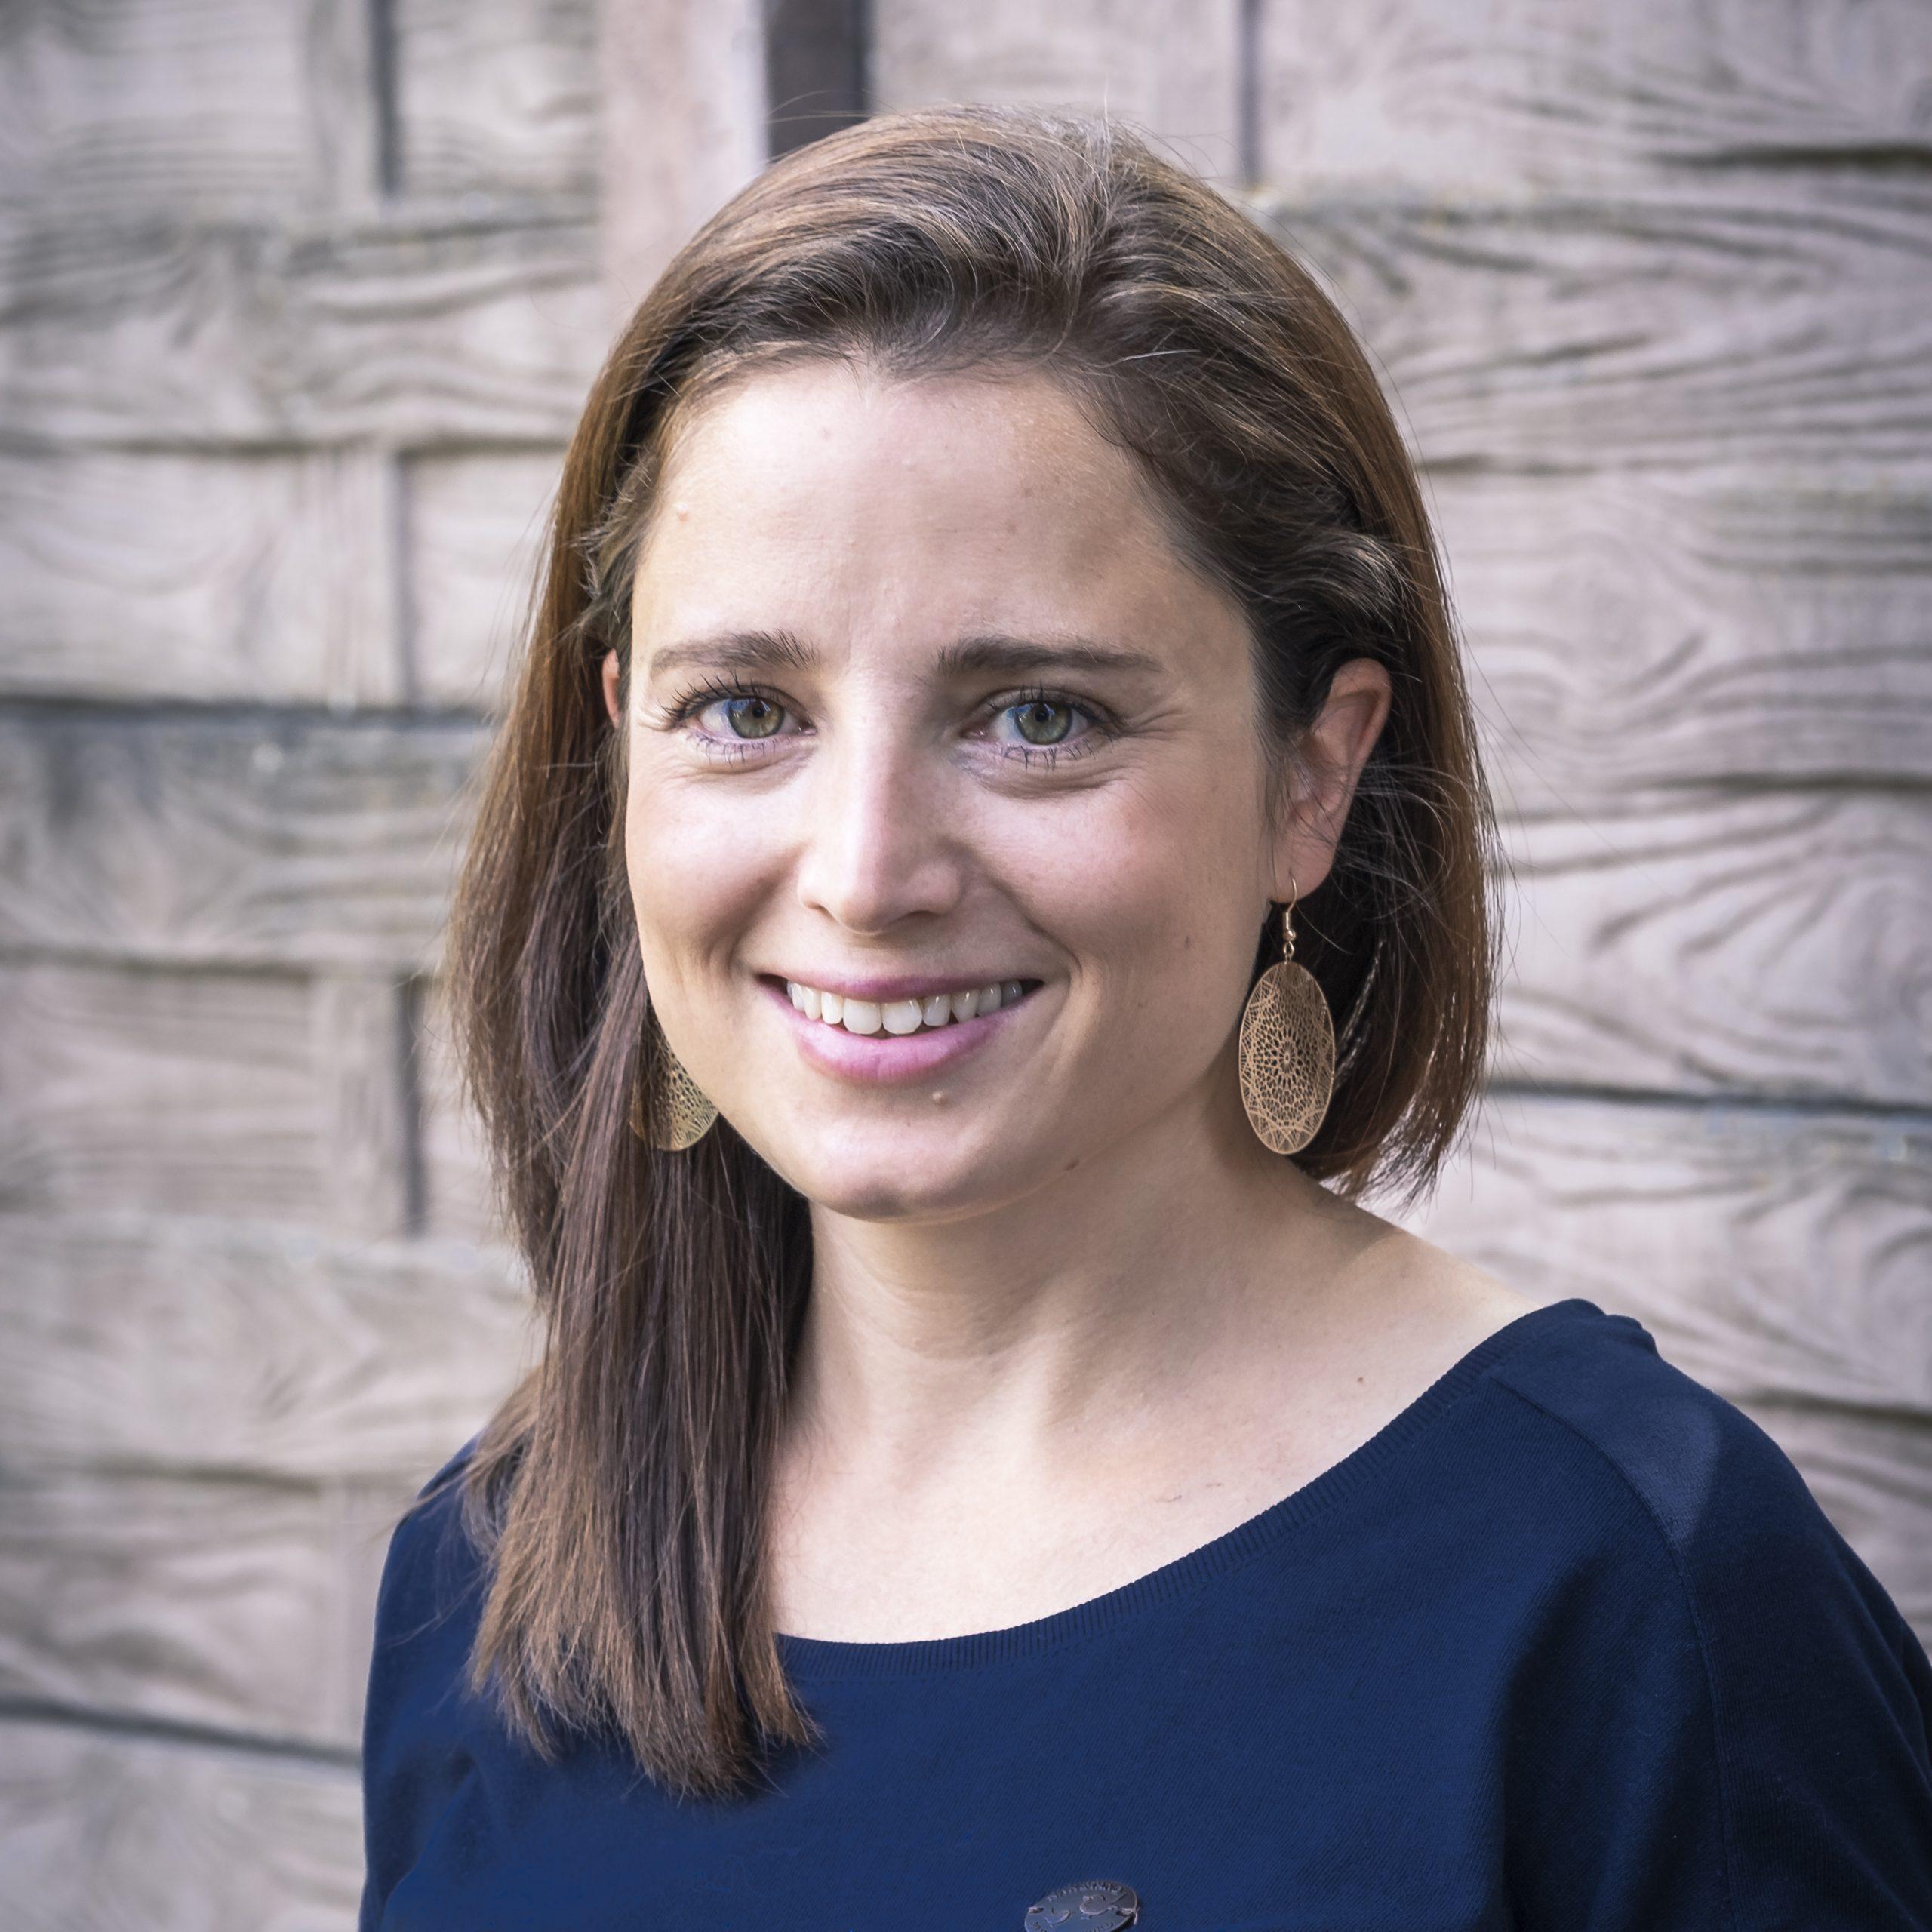 Jacqueline Liesenberg-Kühn